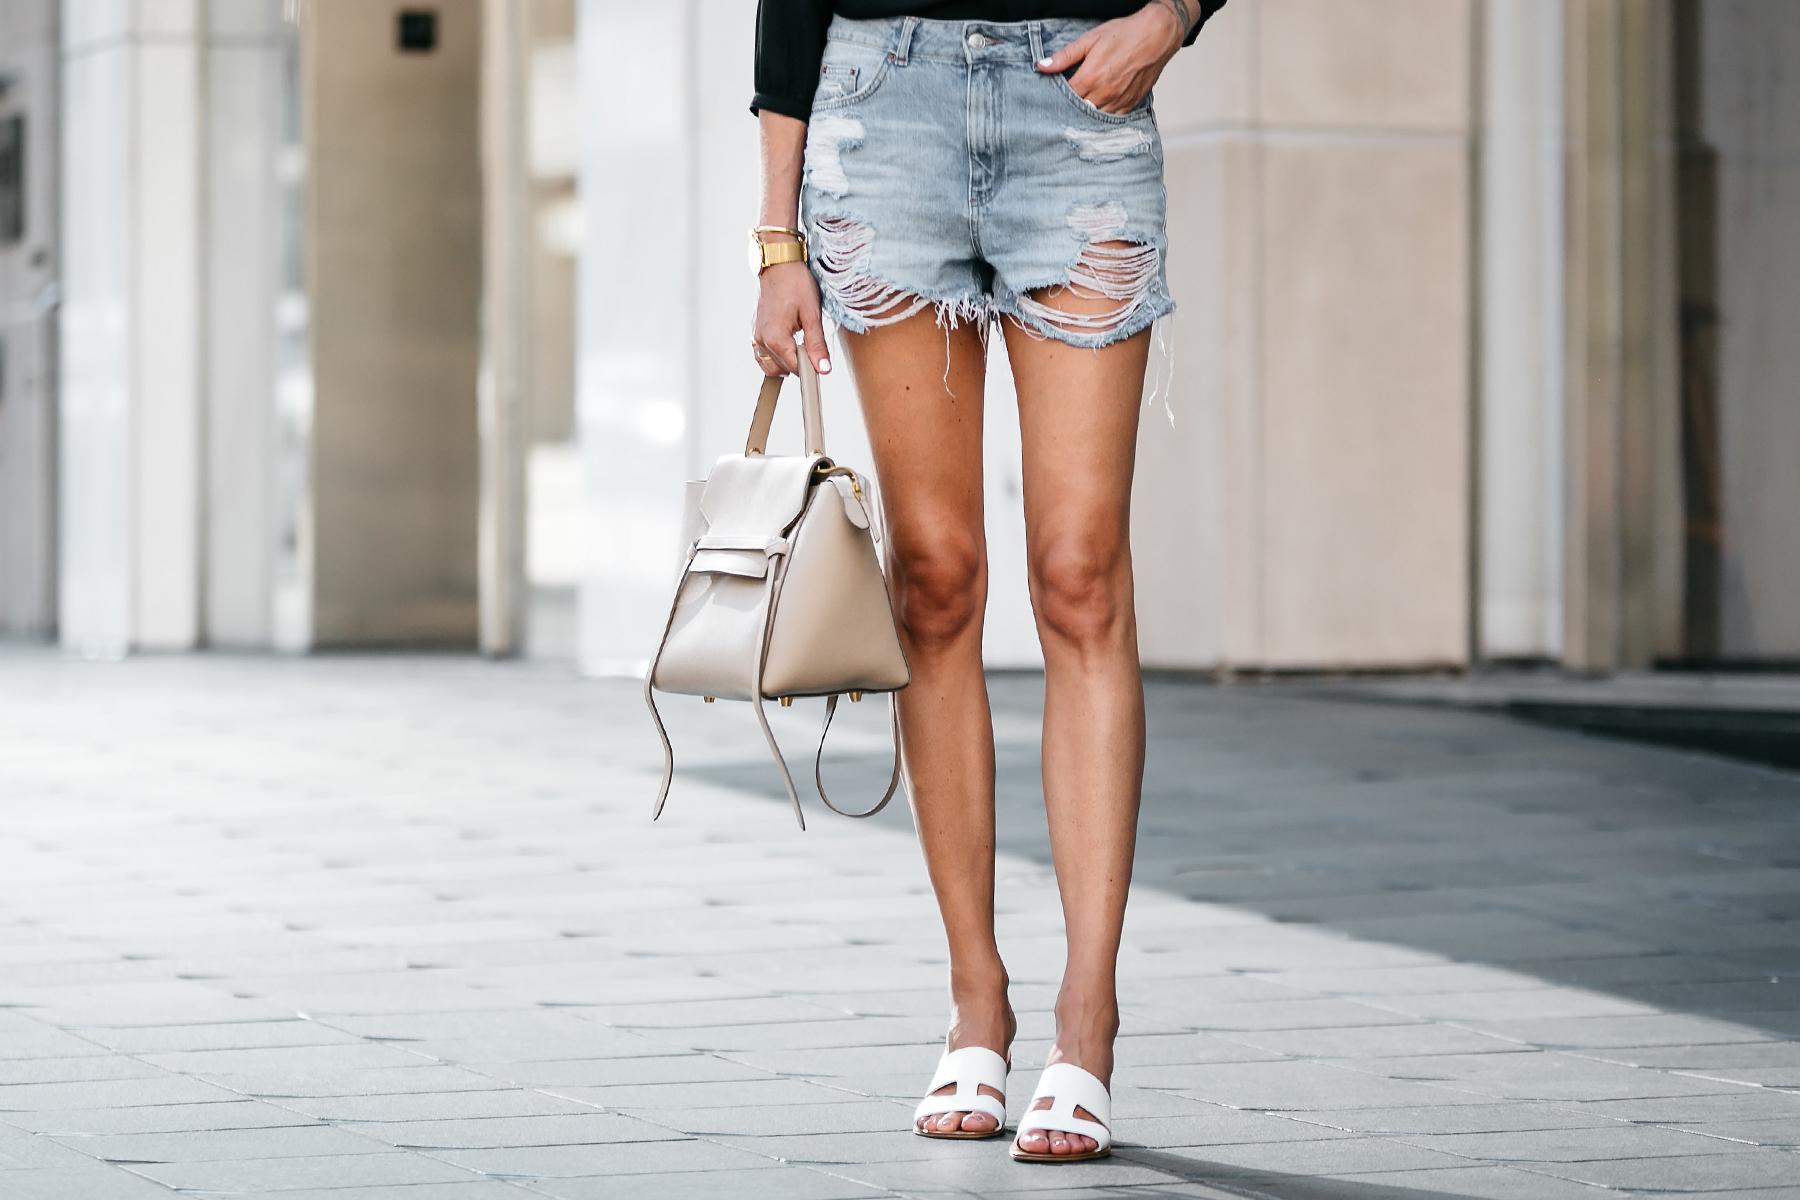 Nodstrom Topshop Denim Ripped Mom Shorts Celine Belt Bag Everlane White Bridge Sandals Fashion Jackson Dallas Blogger Fashion Blogger Street Style